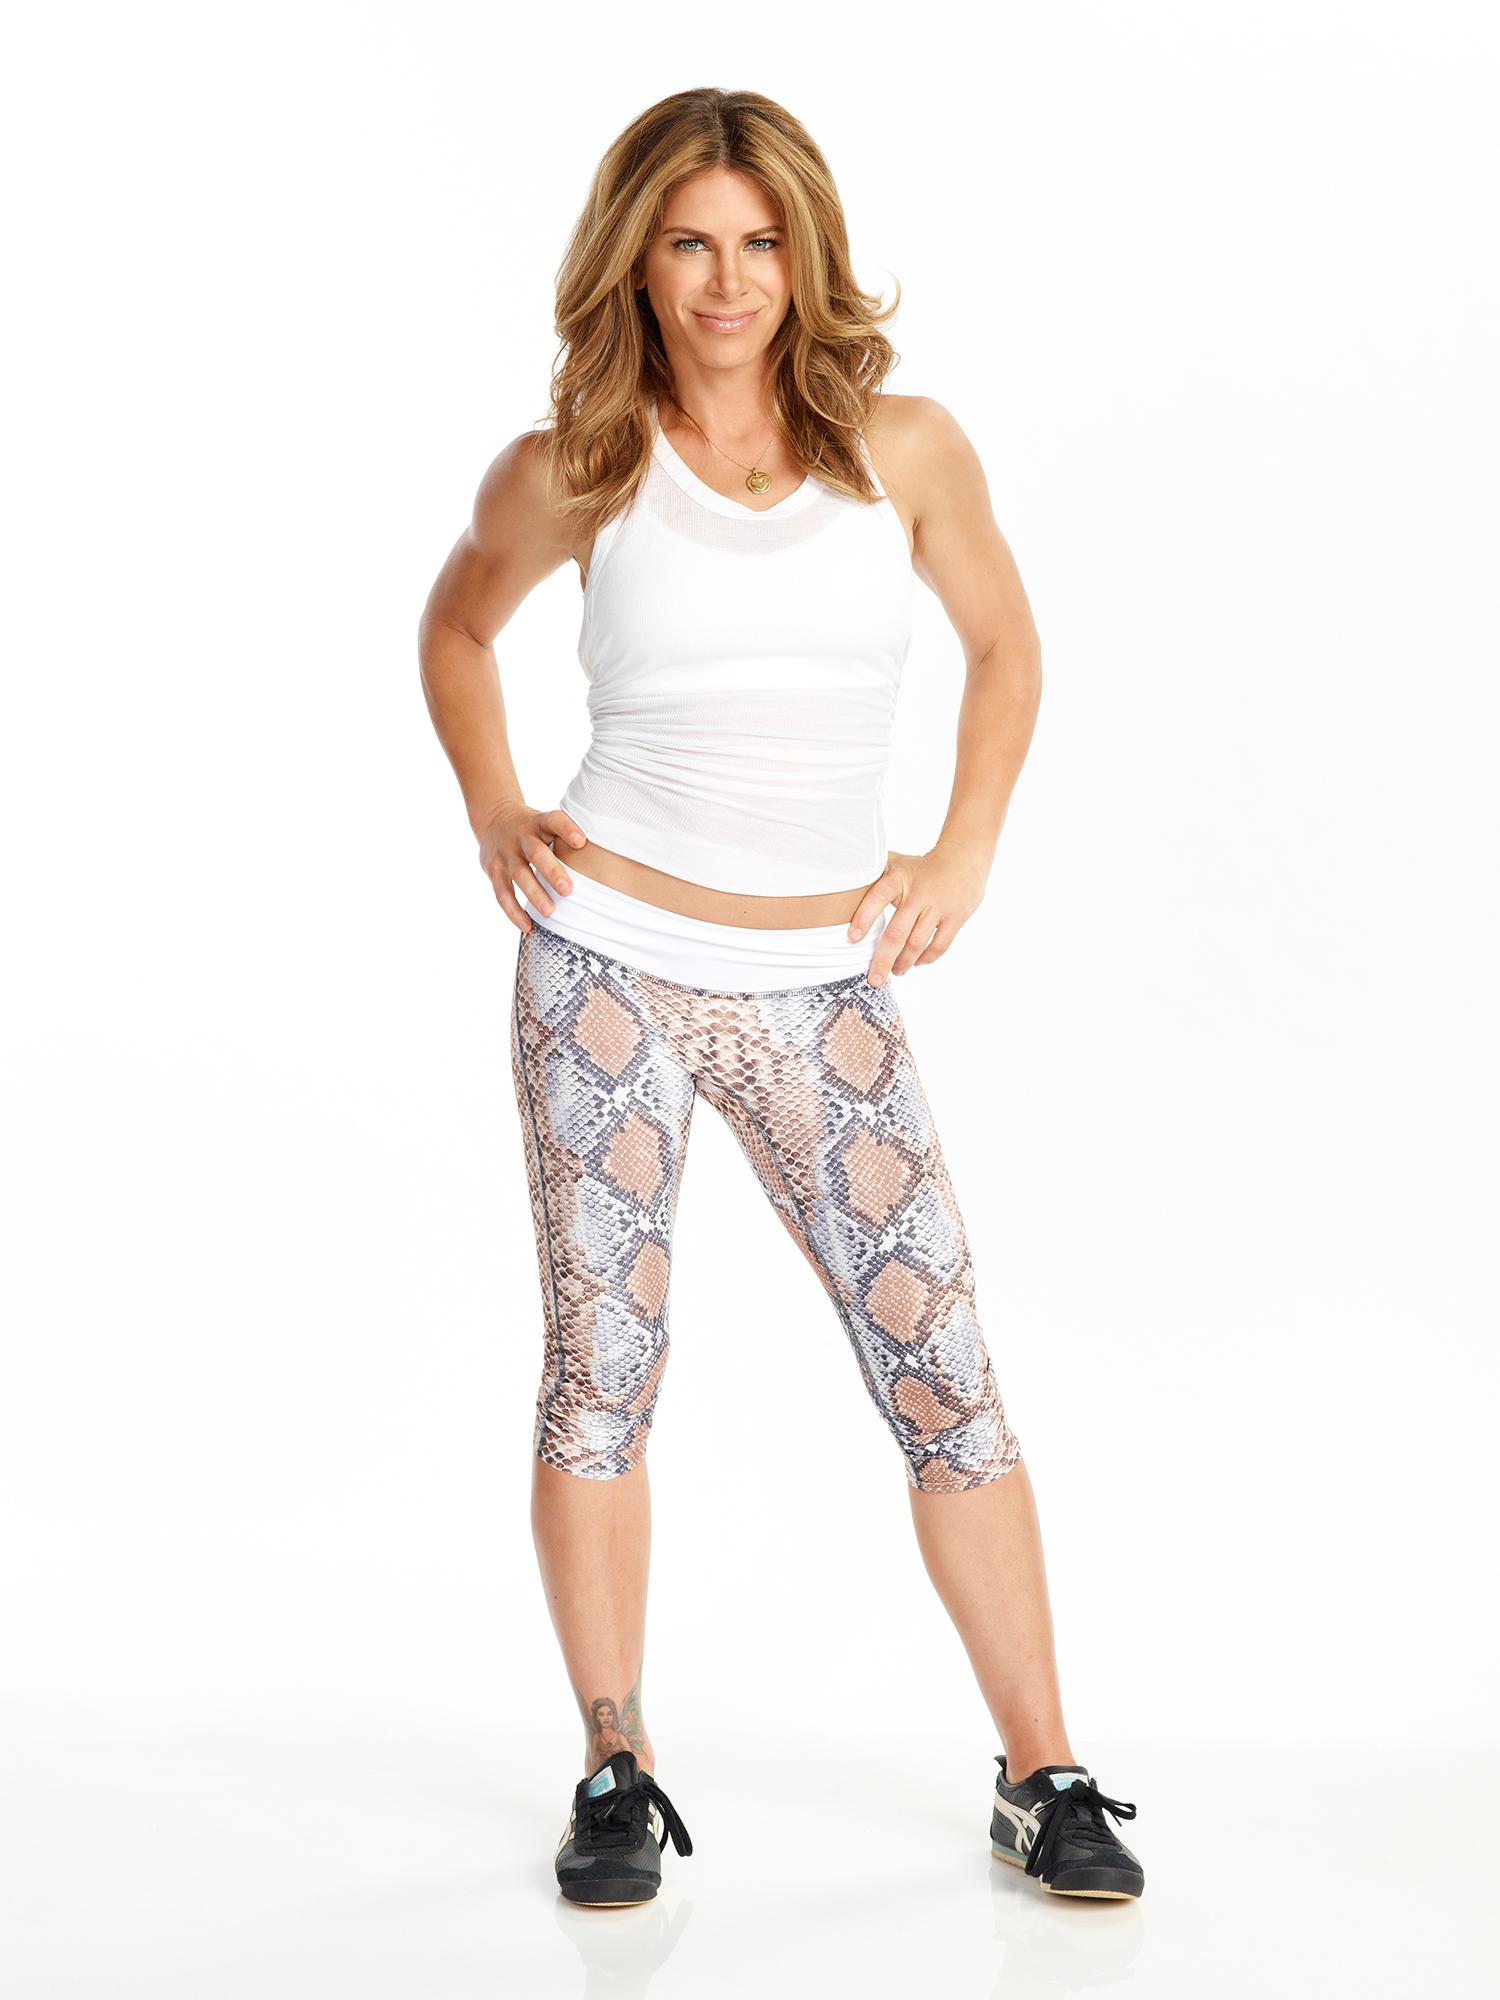 Jillian Michaels Slams the Keto Diet Again - Jillian Michaels